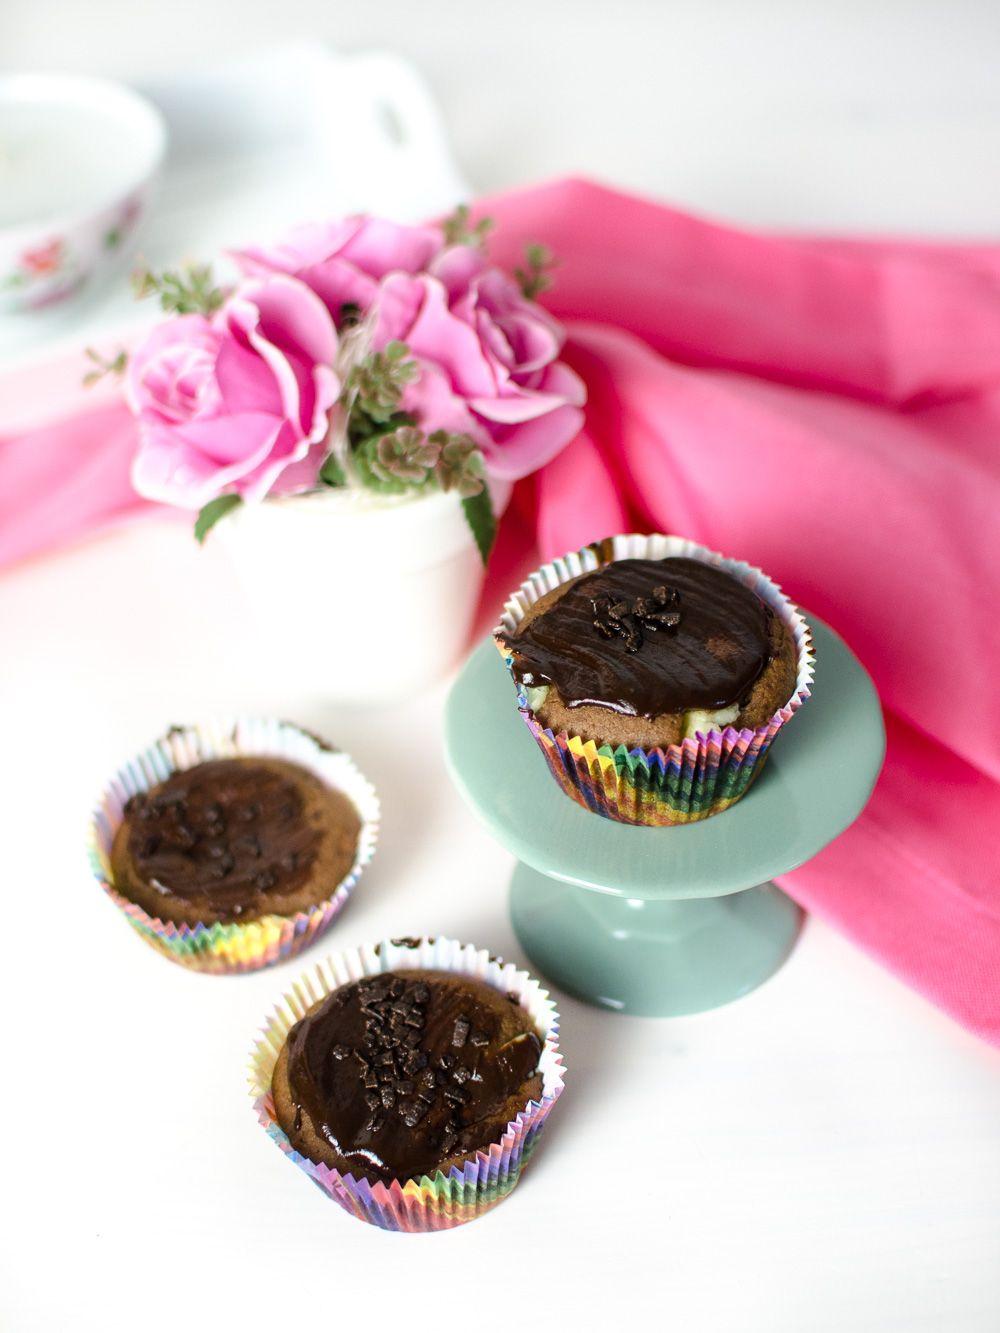 Rezept: Schoko-Frischkäse Muffins   andysparkles